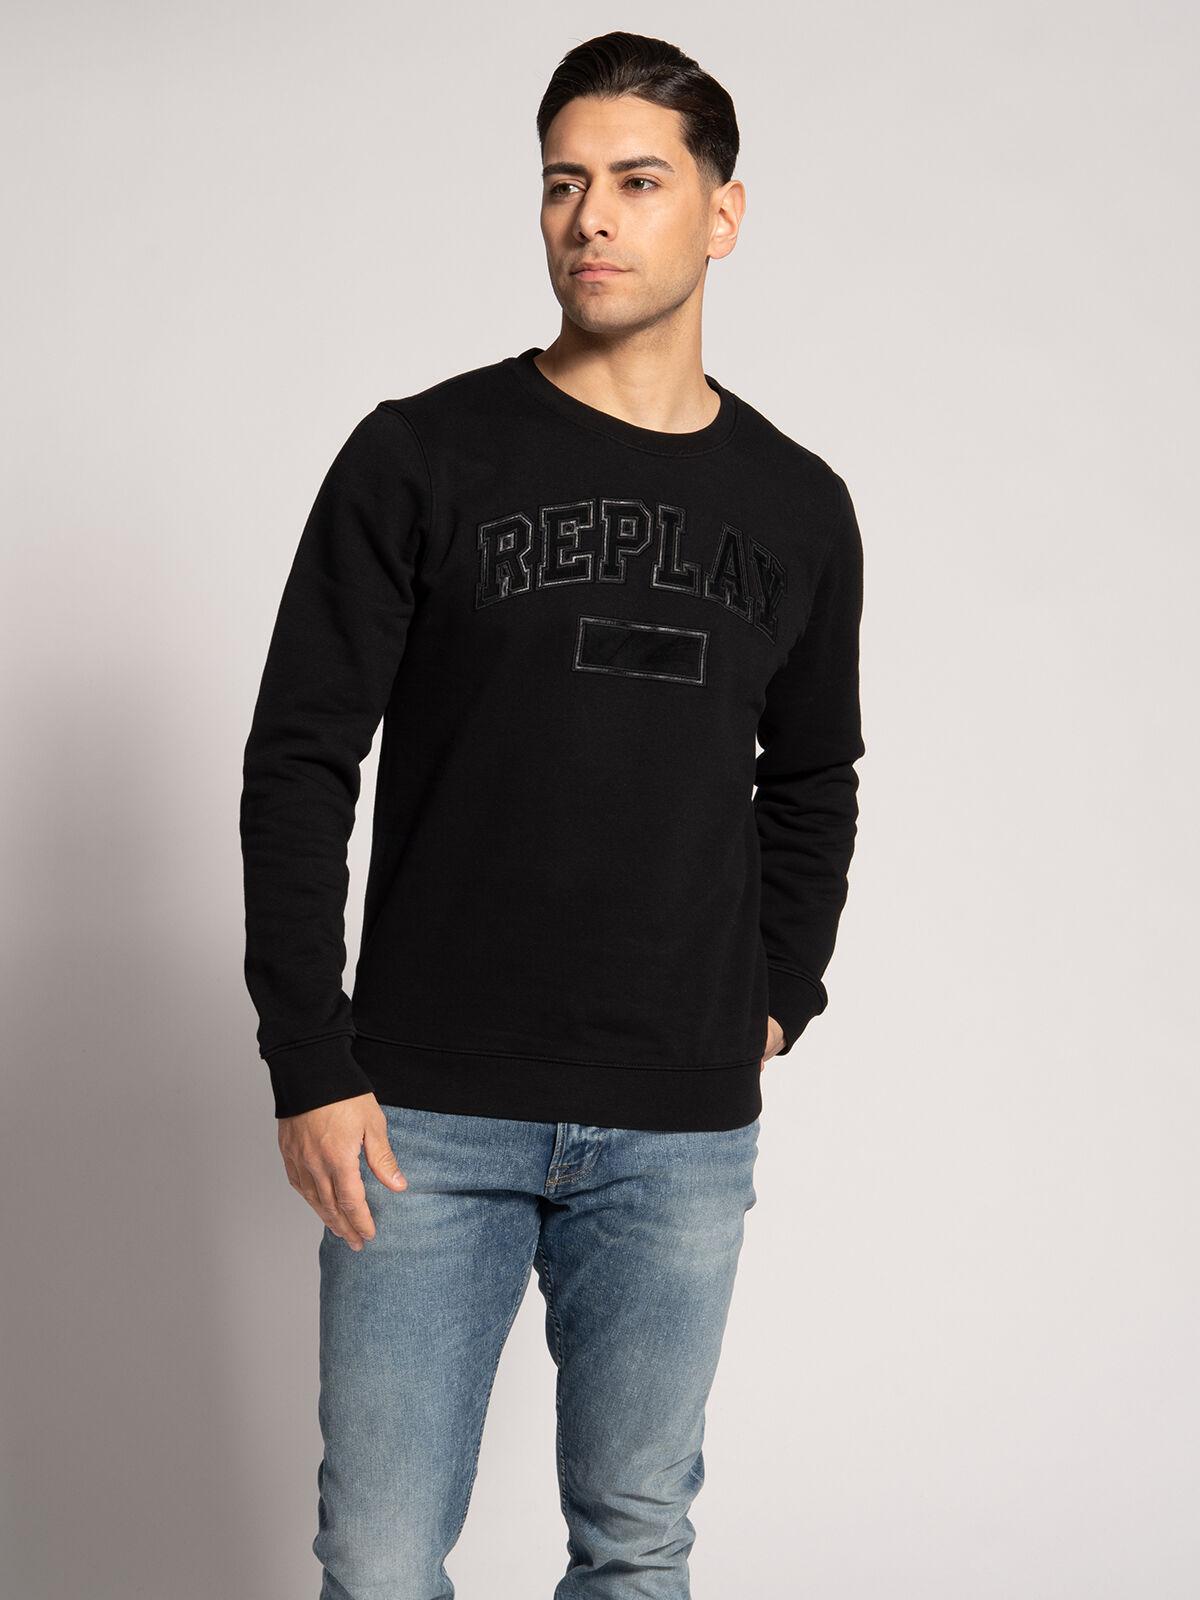 Replay Sweatshirt | Bibloo.at